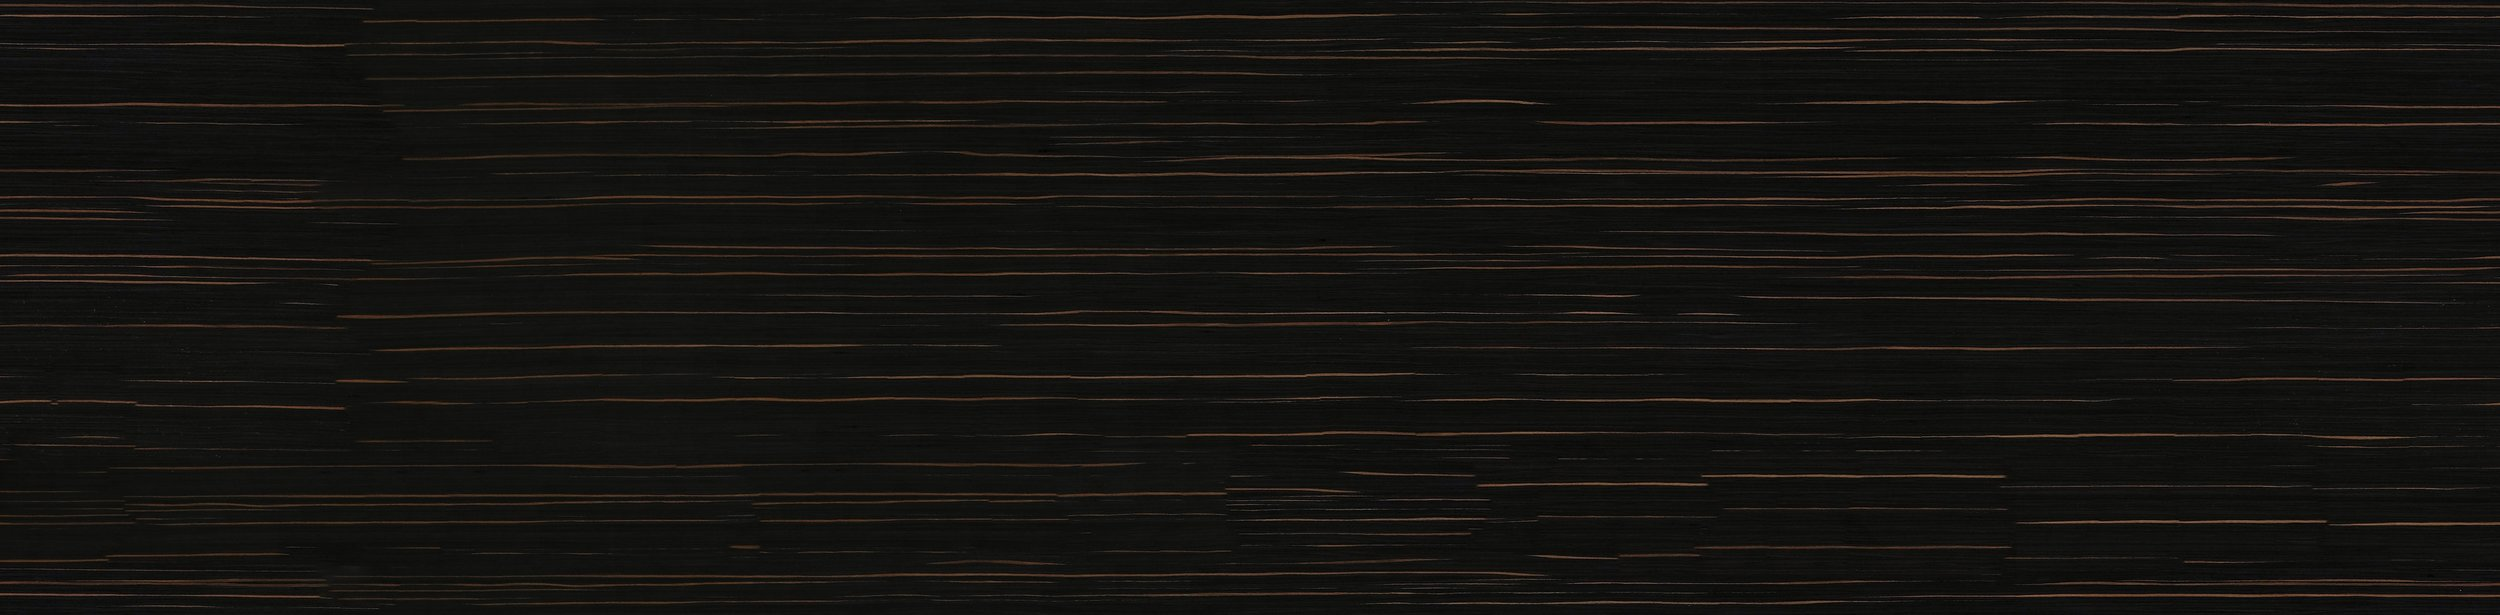 Item+Ebony+10.42+%28250x60cm%29.jpg